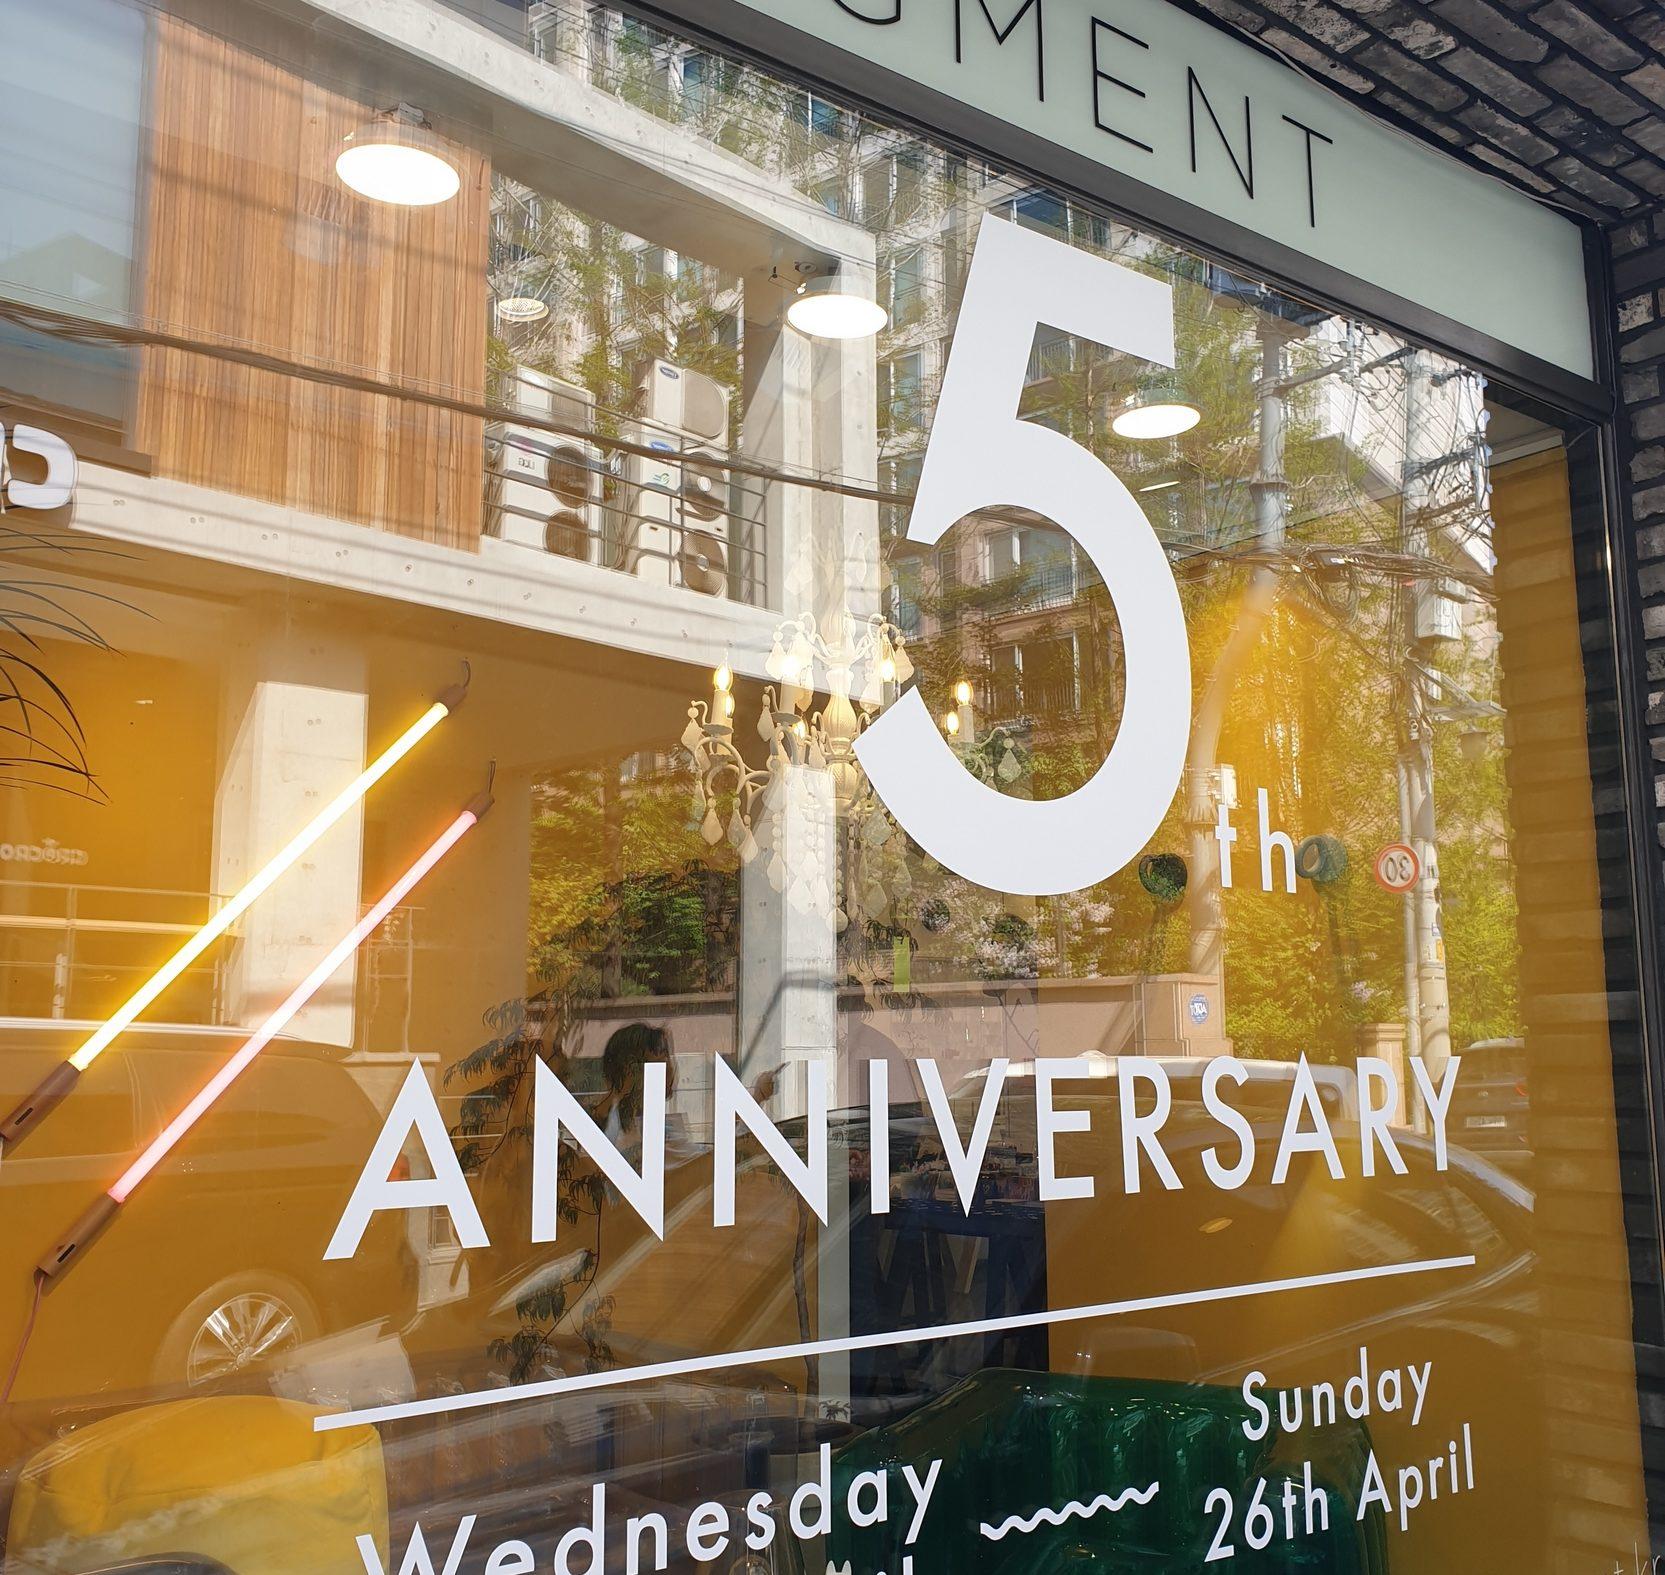 Macon & Lesquoy celebrates Segment 5th anniversary.